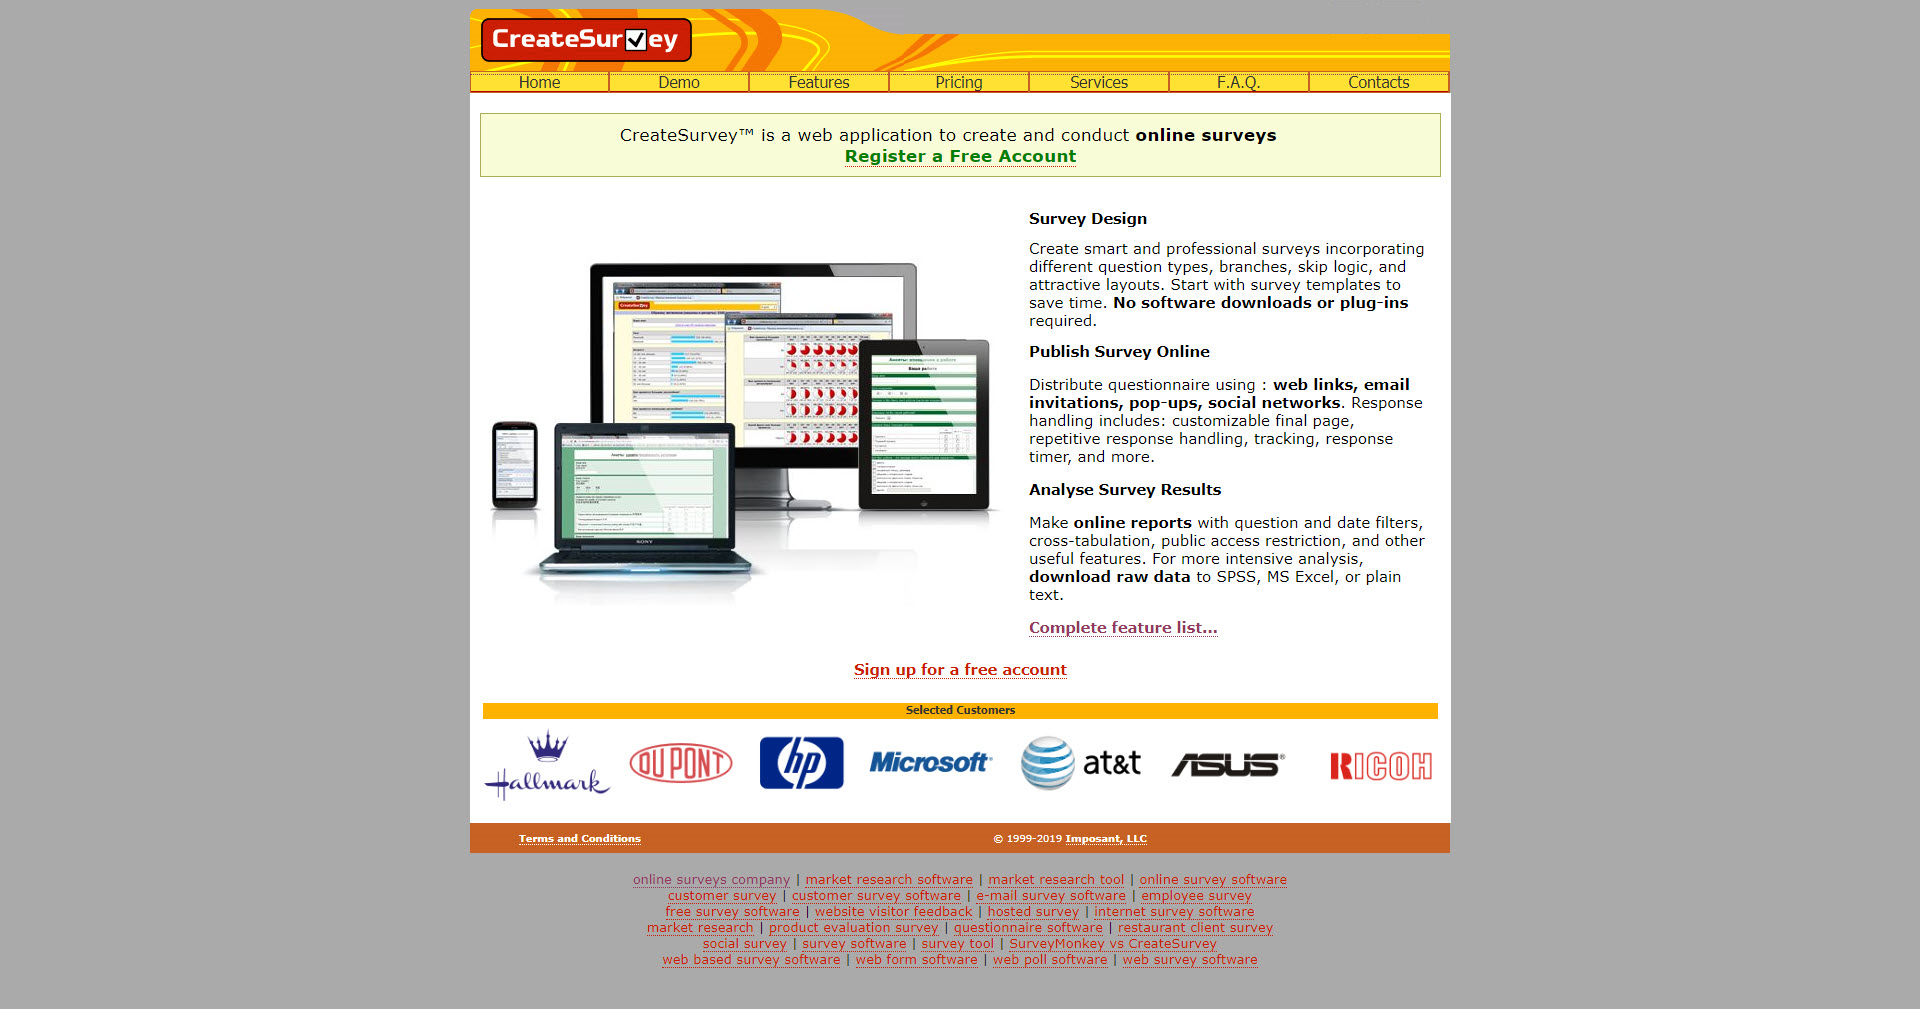 CreateSurvey